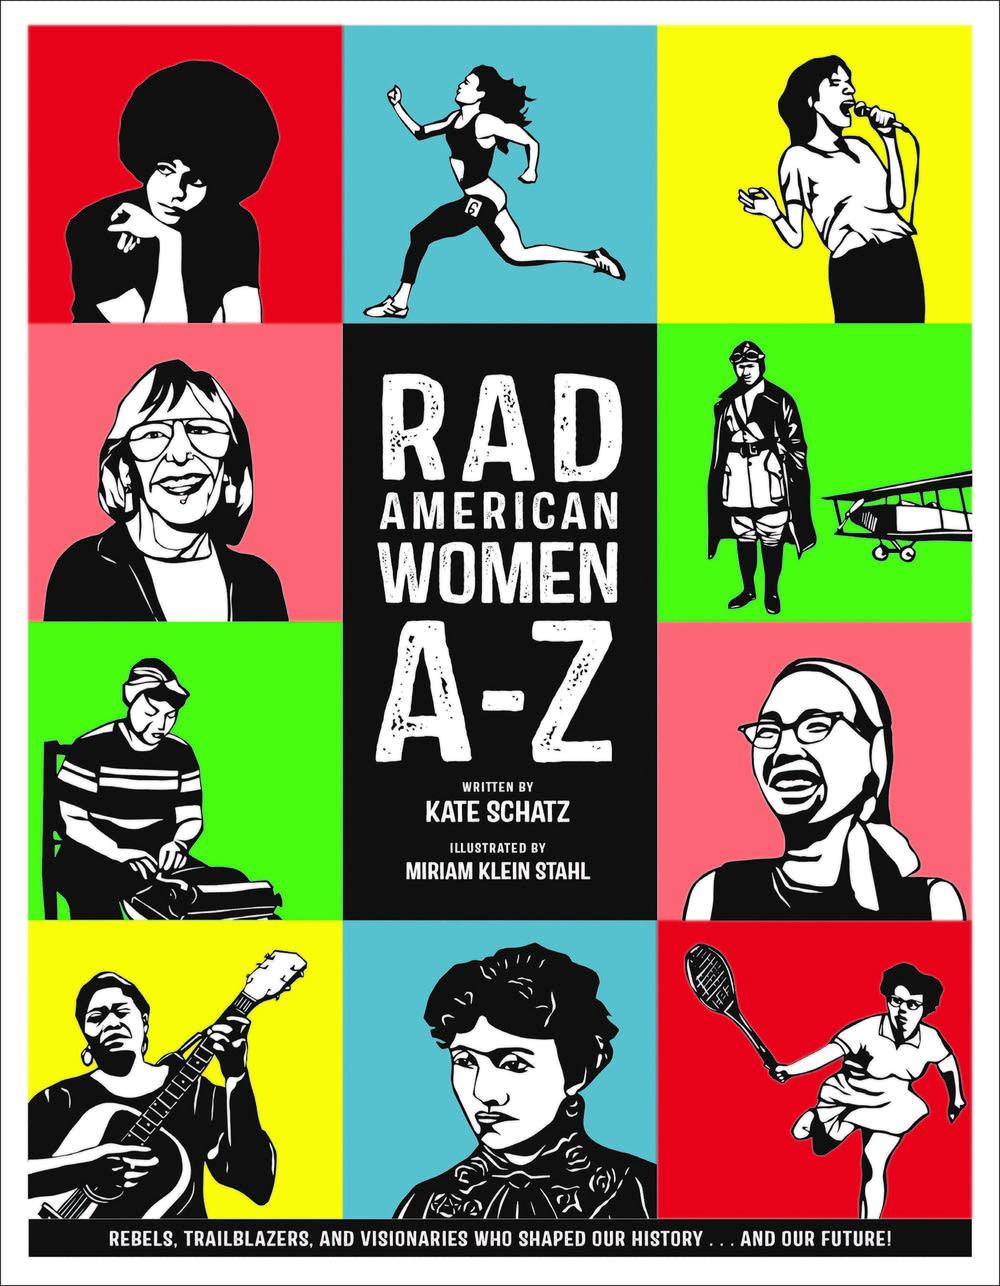 'Rad American Women' by Kate Schatz